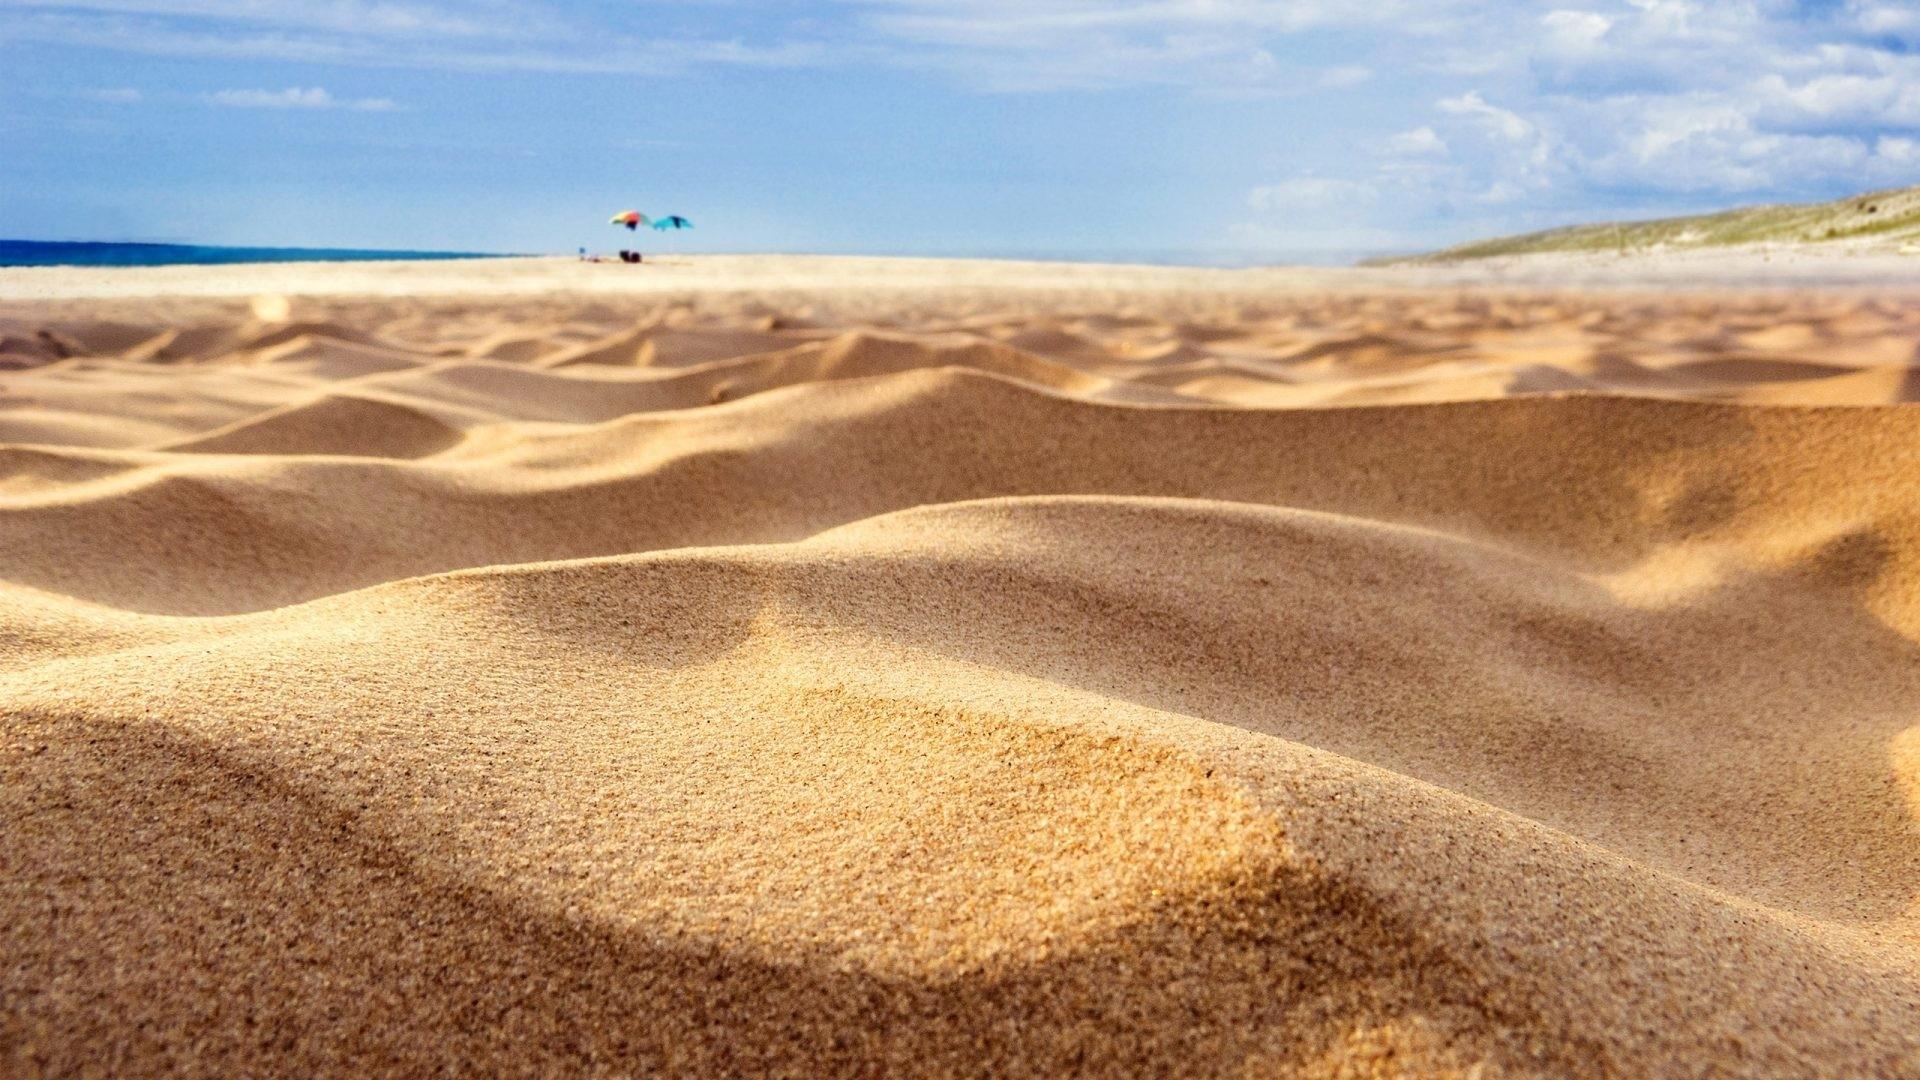 Sand wallpaper photo hd